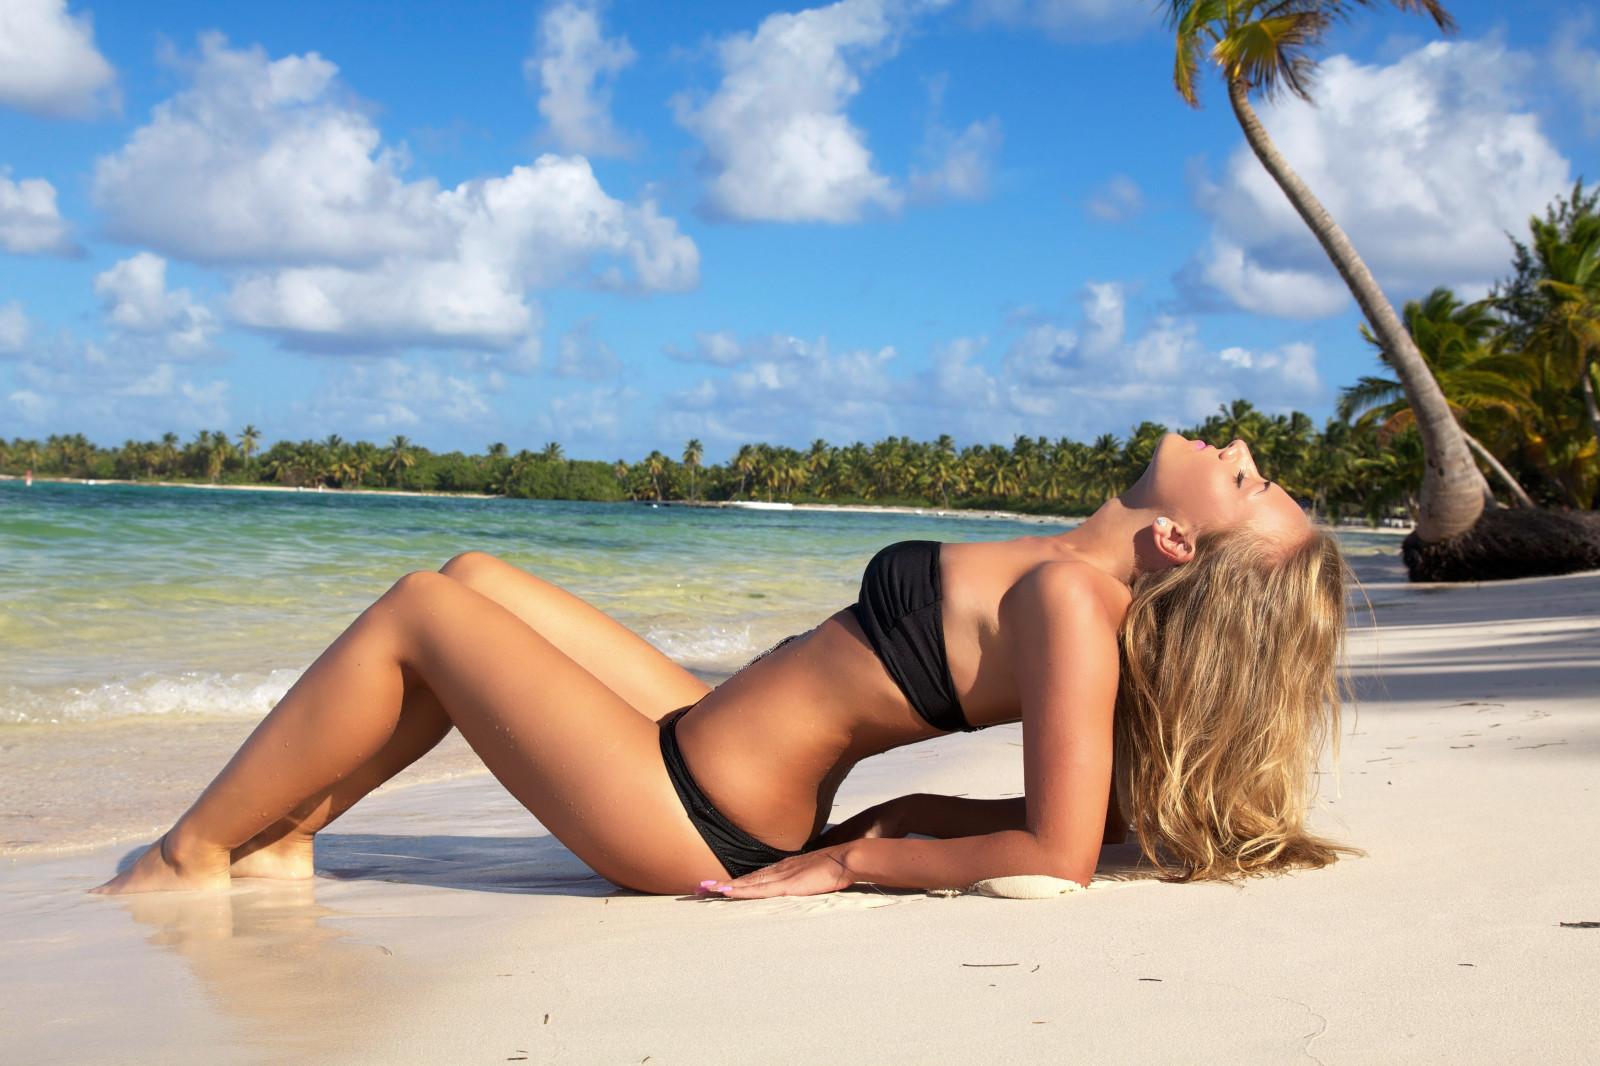 free-bikini-desktop-wallpapers-tits-ass